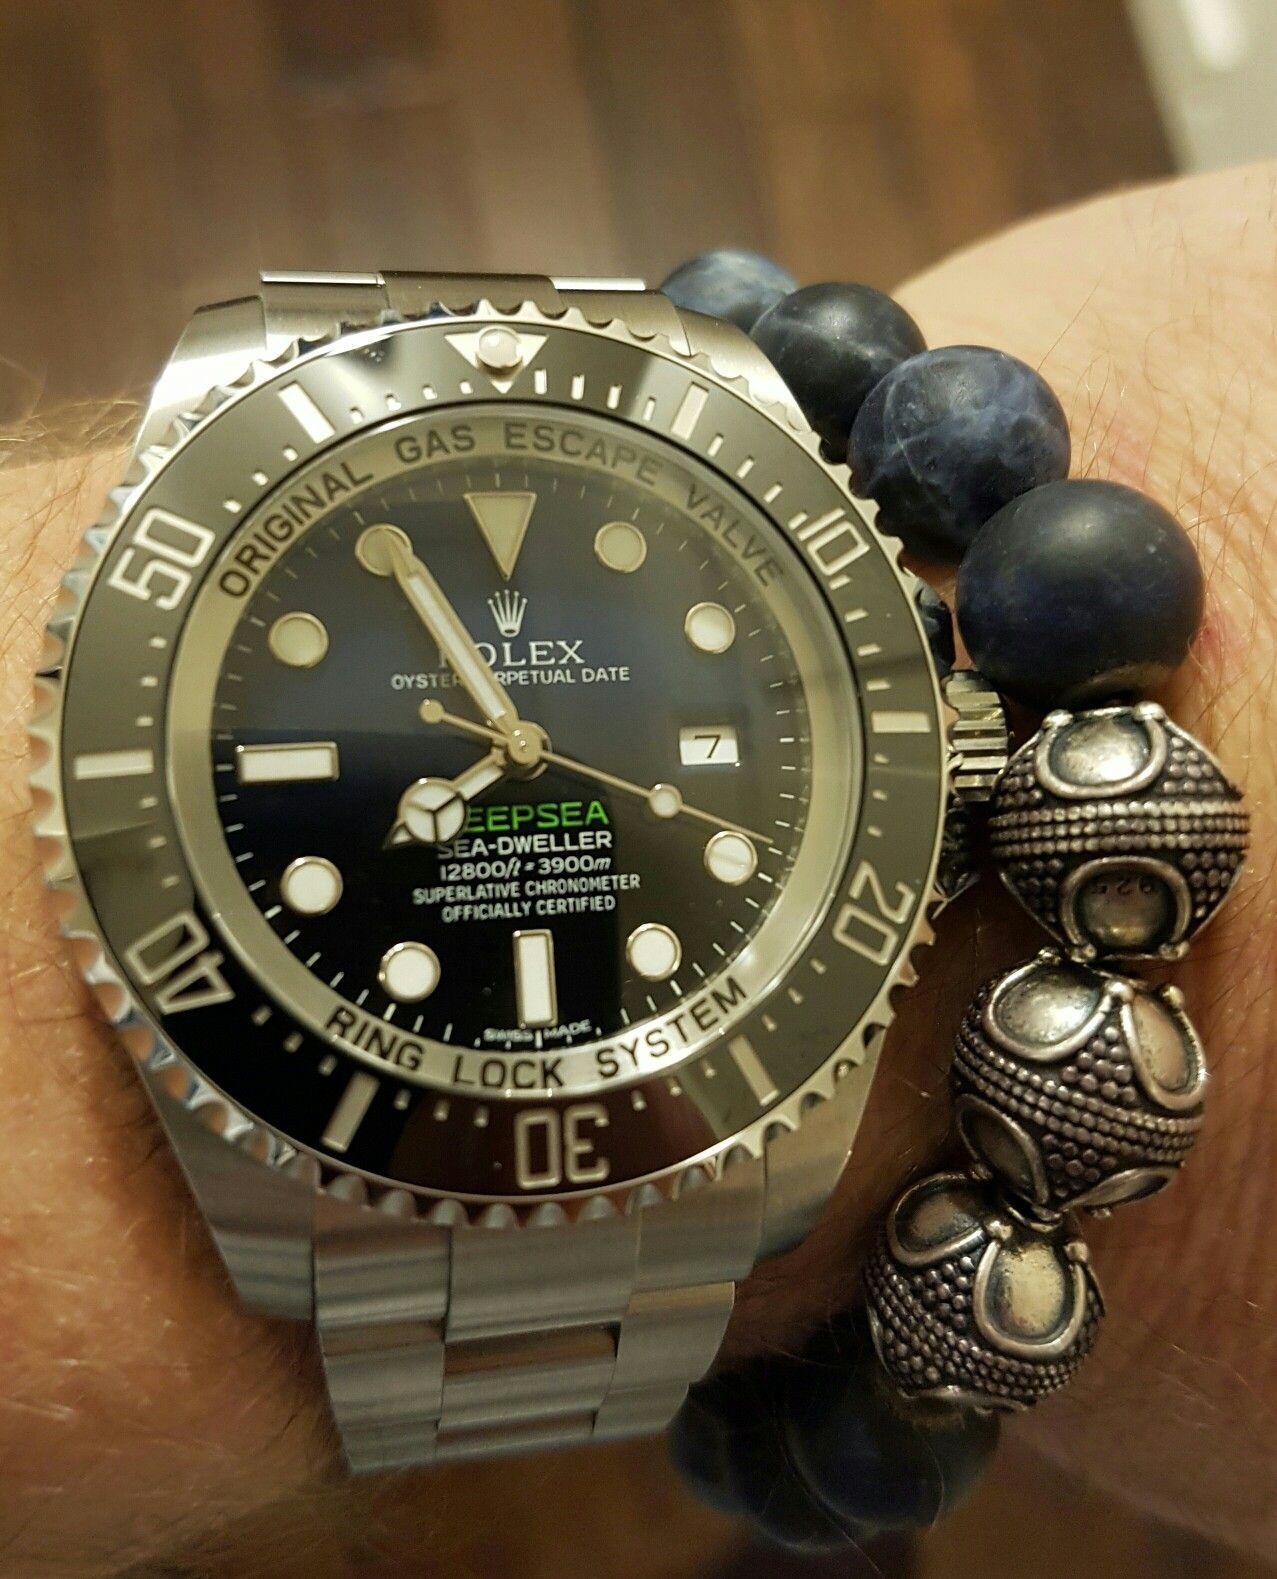 ac078758c17 Rolex Deepsea with blue dial | Tick tock | Pinterest